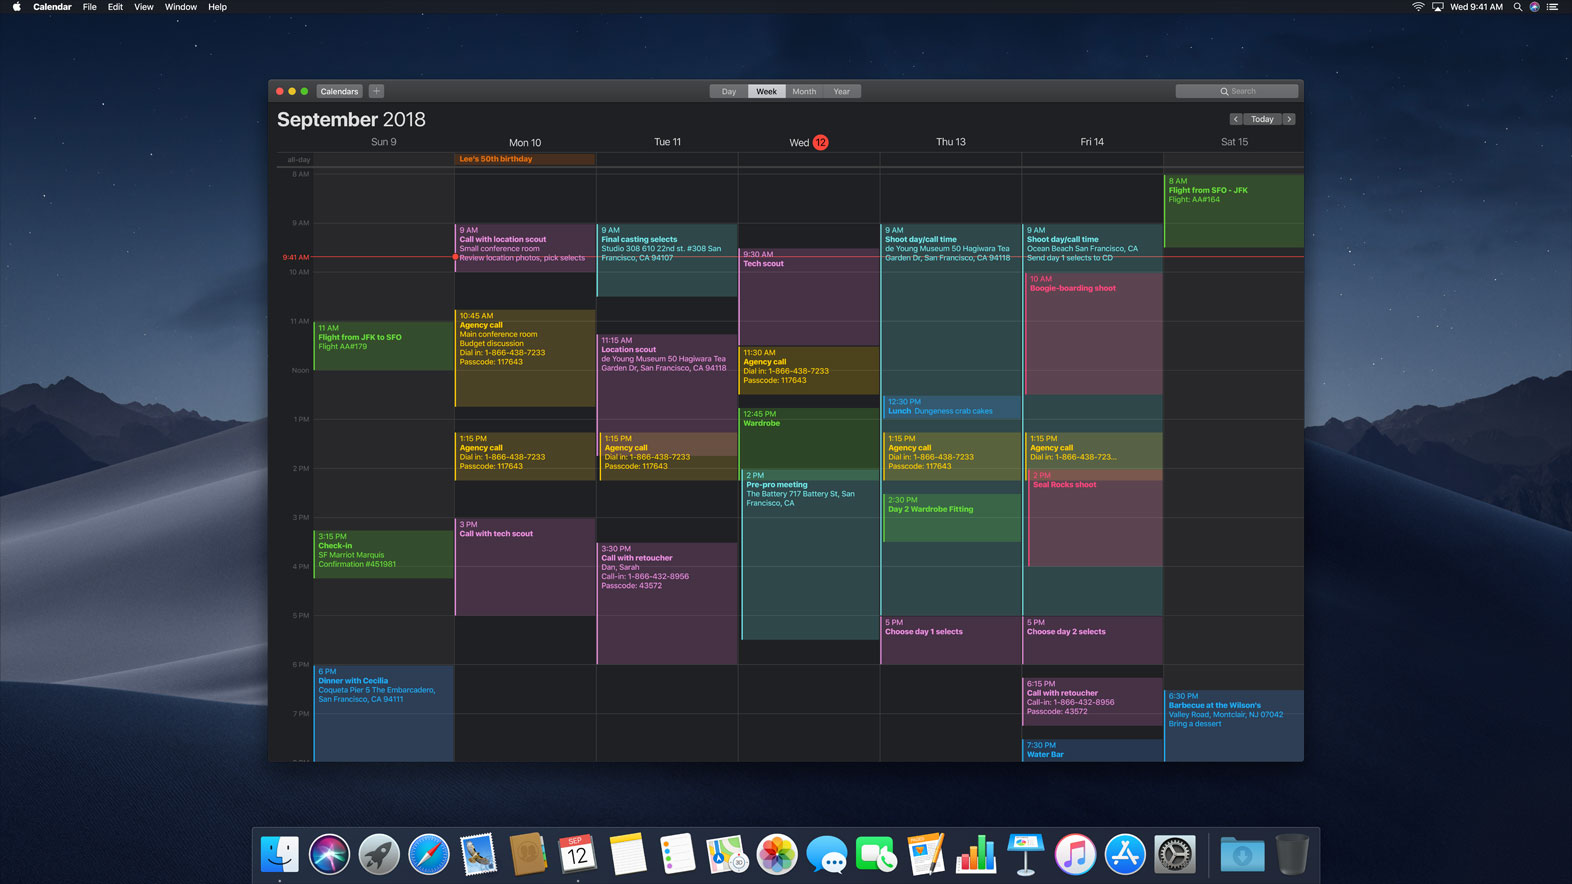 https://www.apple.com/nl/macos/mojave/overview/darkmode/gallery/calendar/image_large_2x.jpg